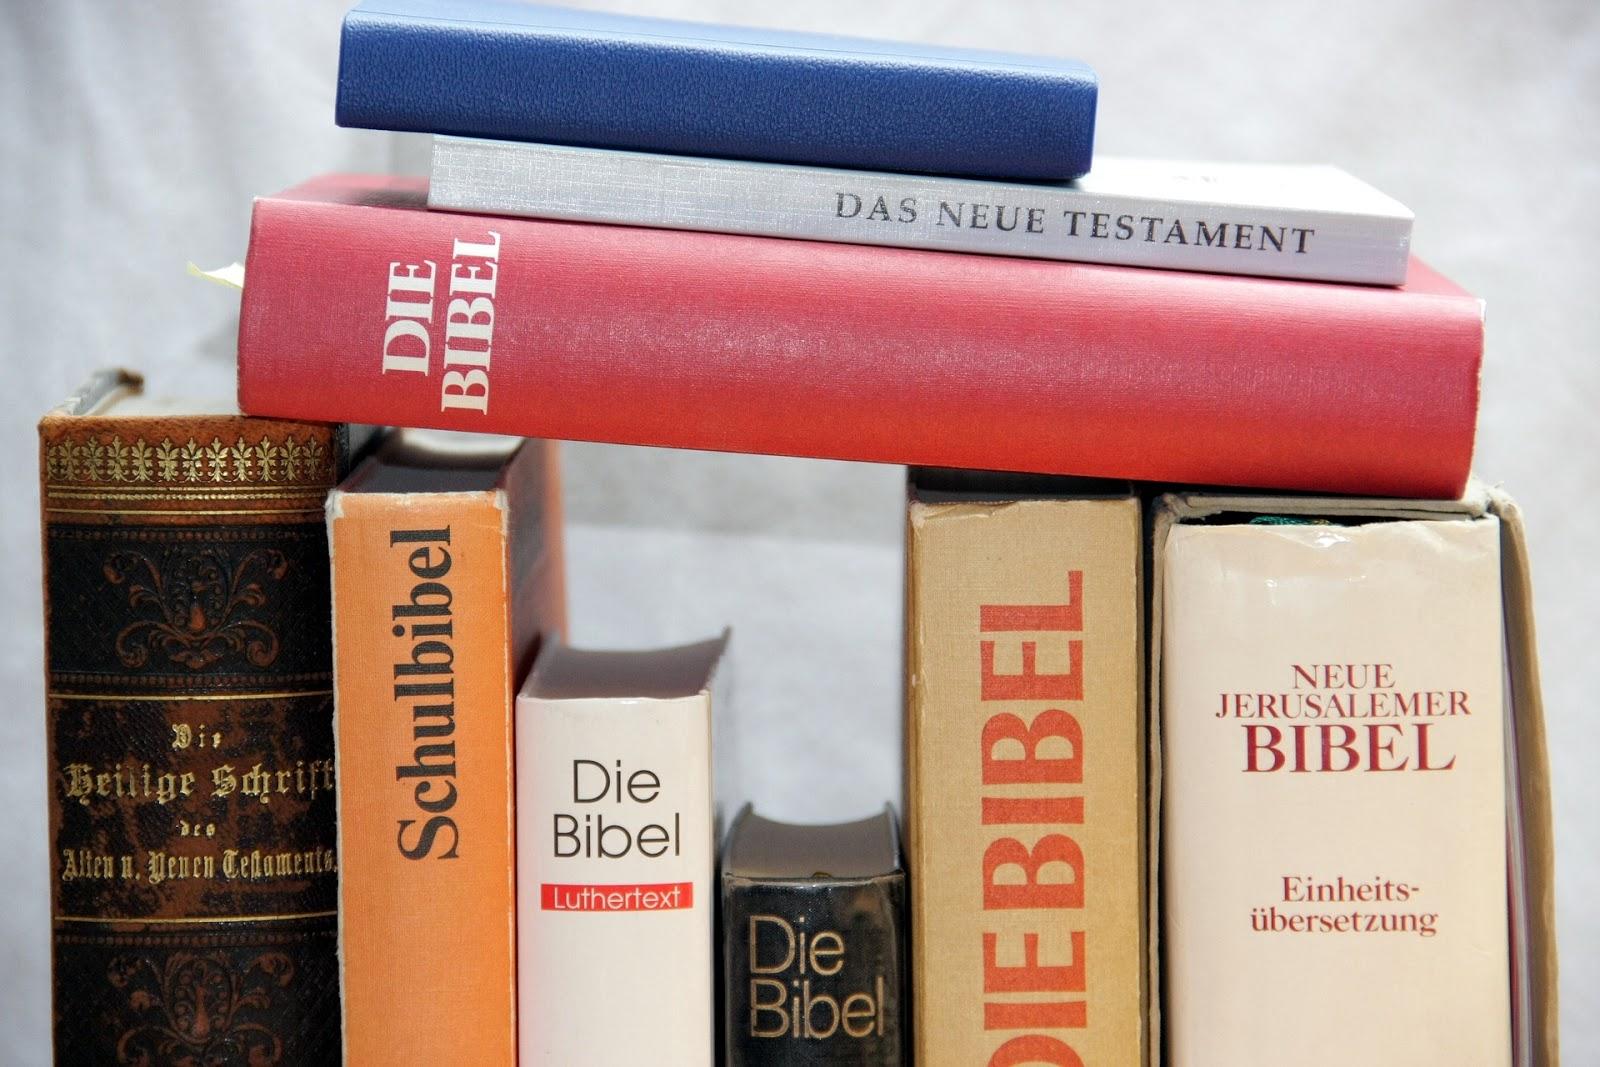 Bíblias reforma protestante